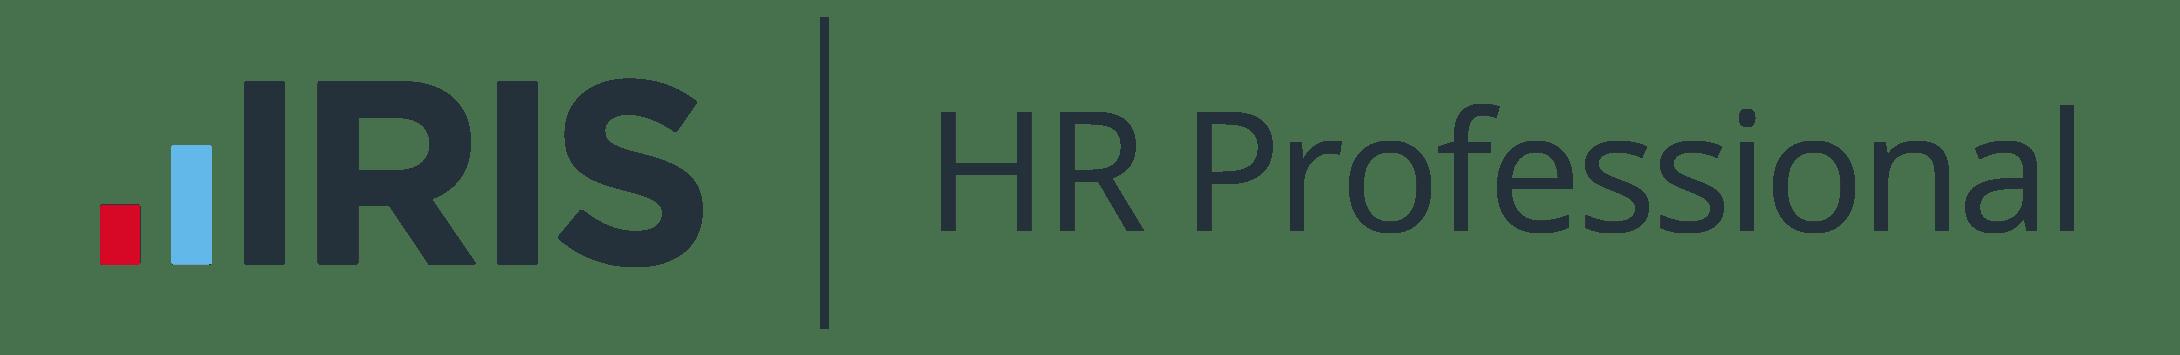 IRIS HR Professional logo